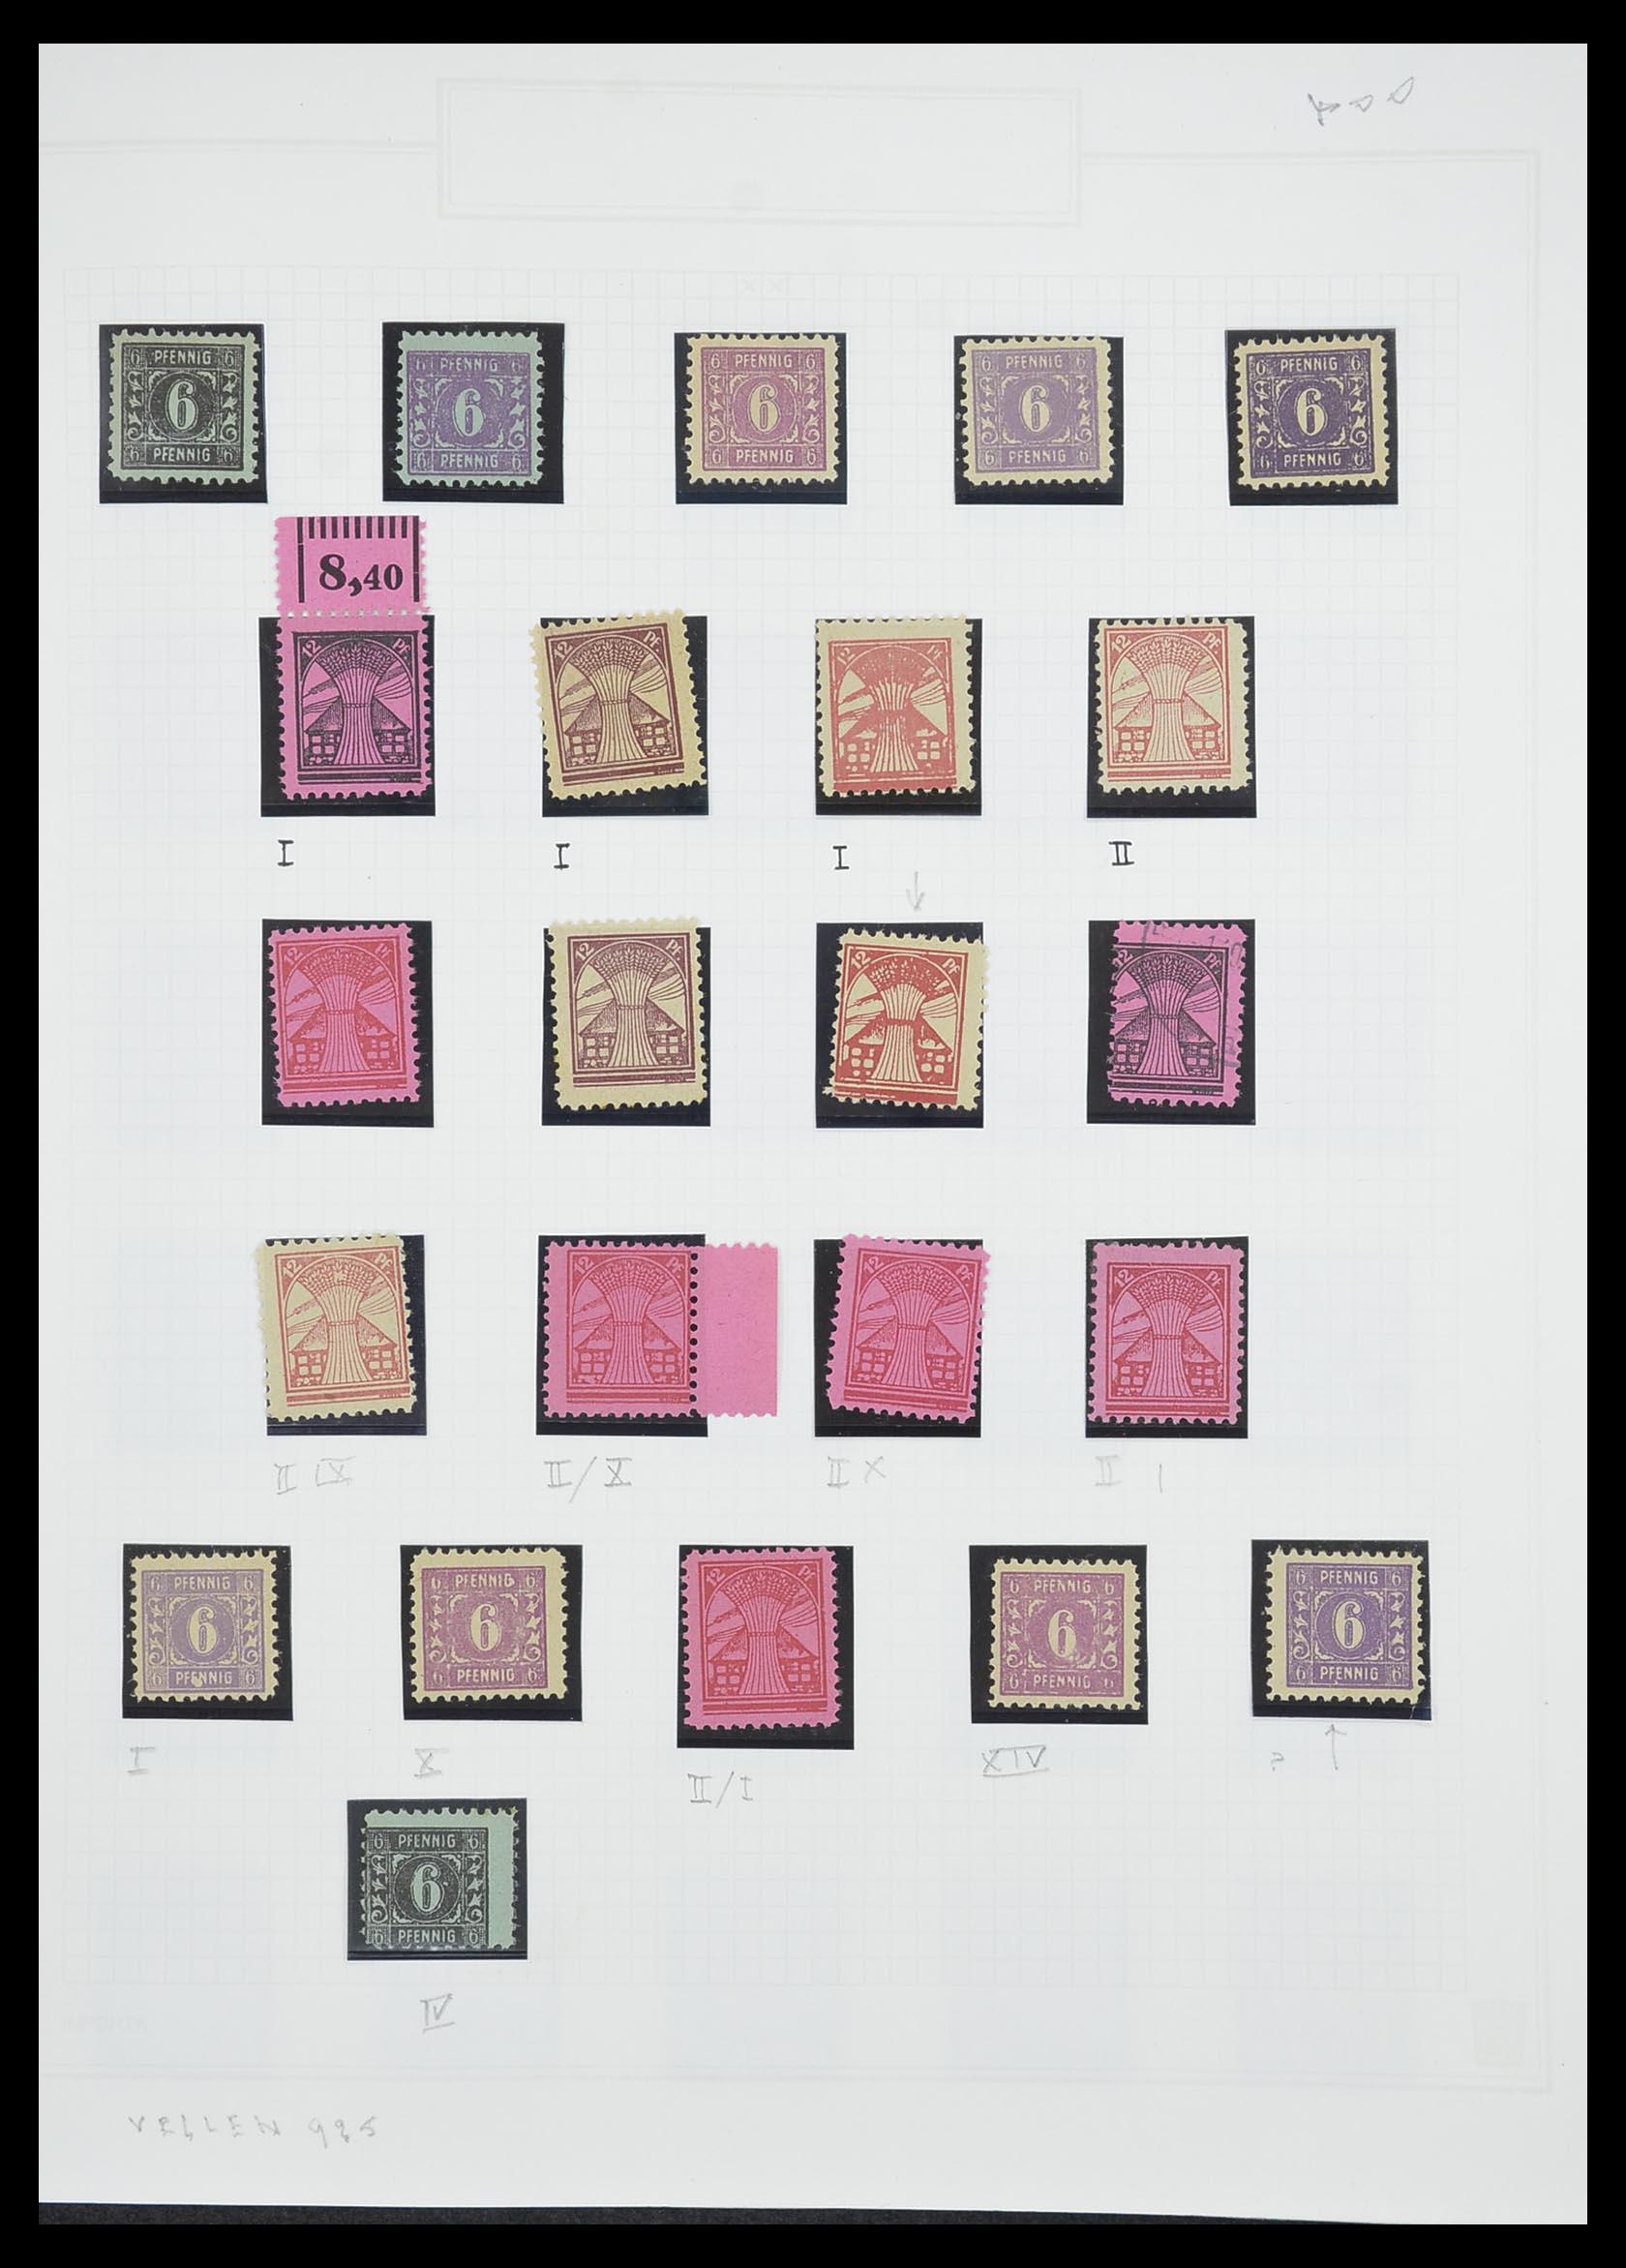 33698 011 - Postzegelverzameling 33698 Sovjet Zone 1945-1948.